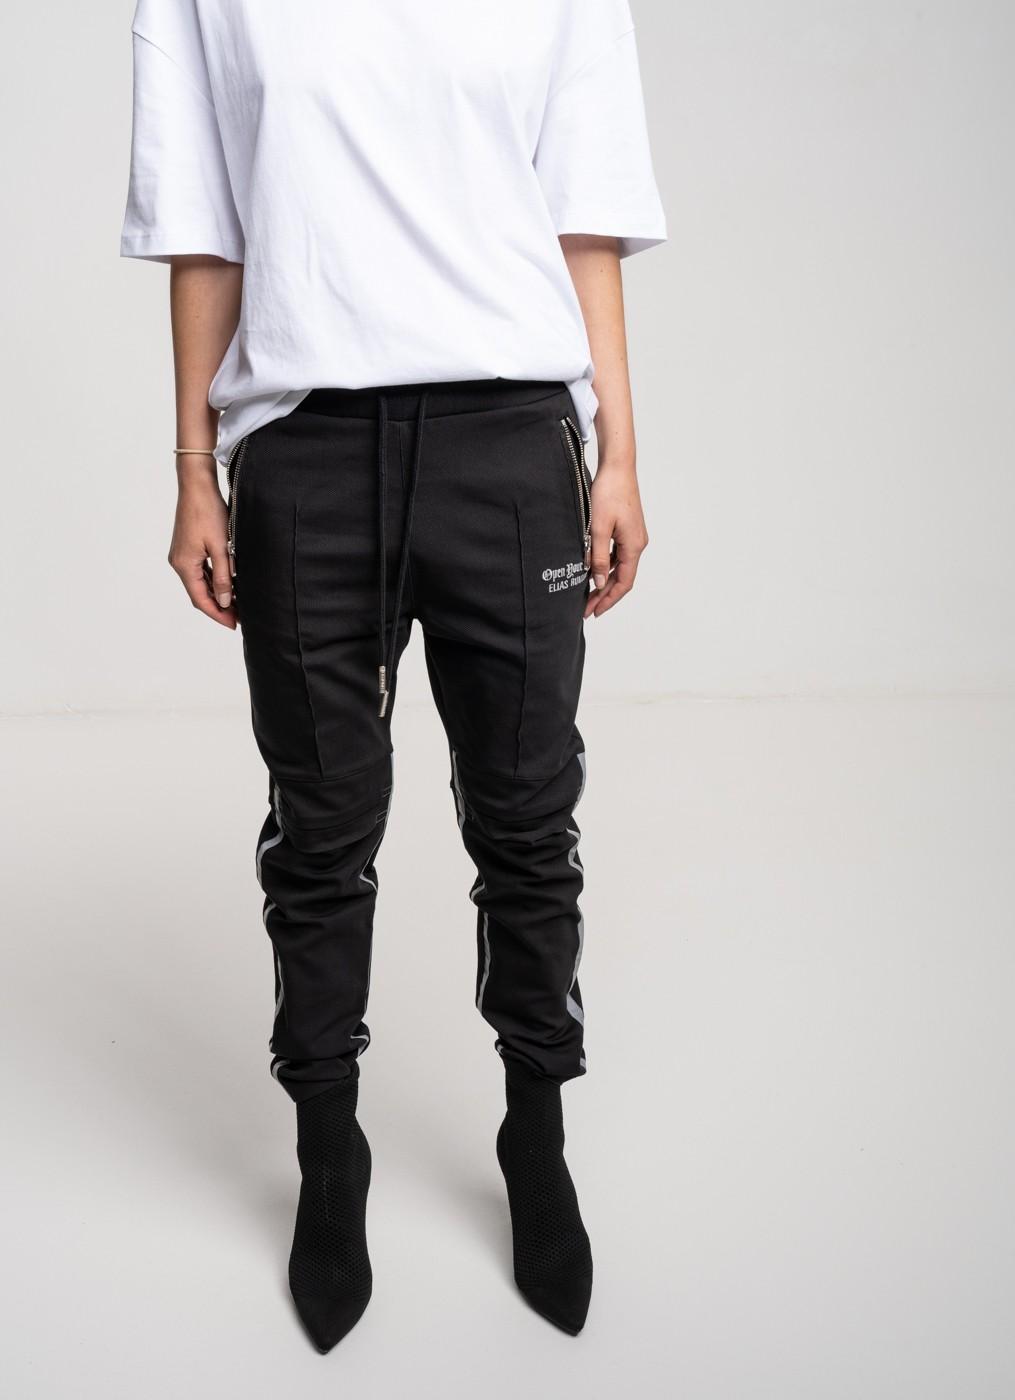 ER Wendy reflective - pants